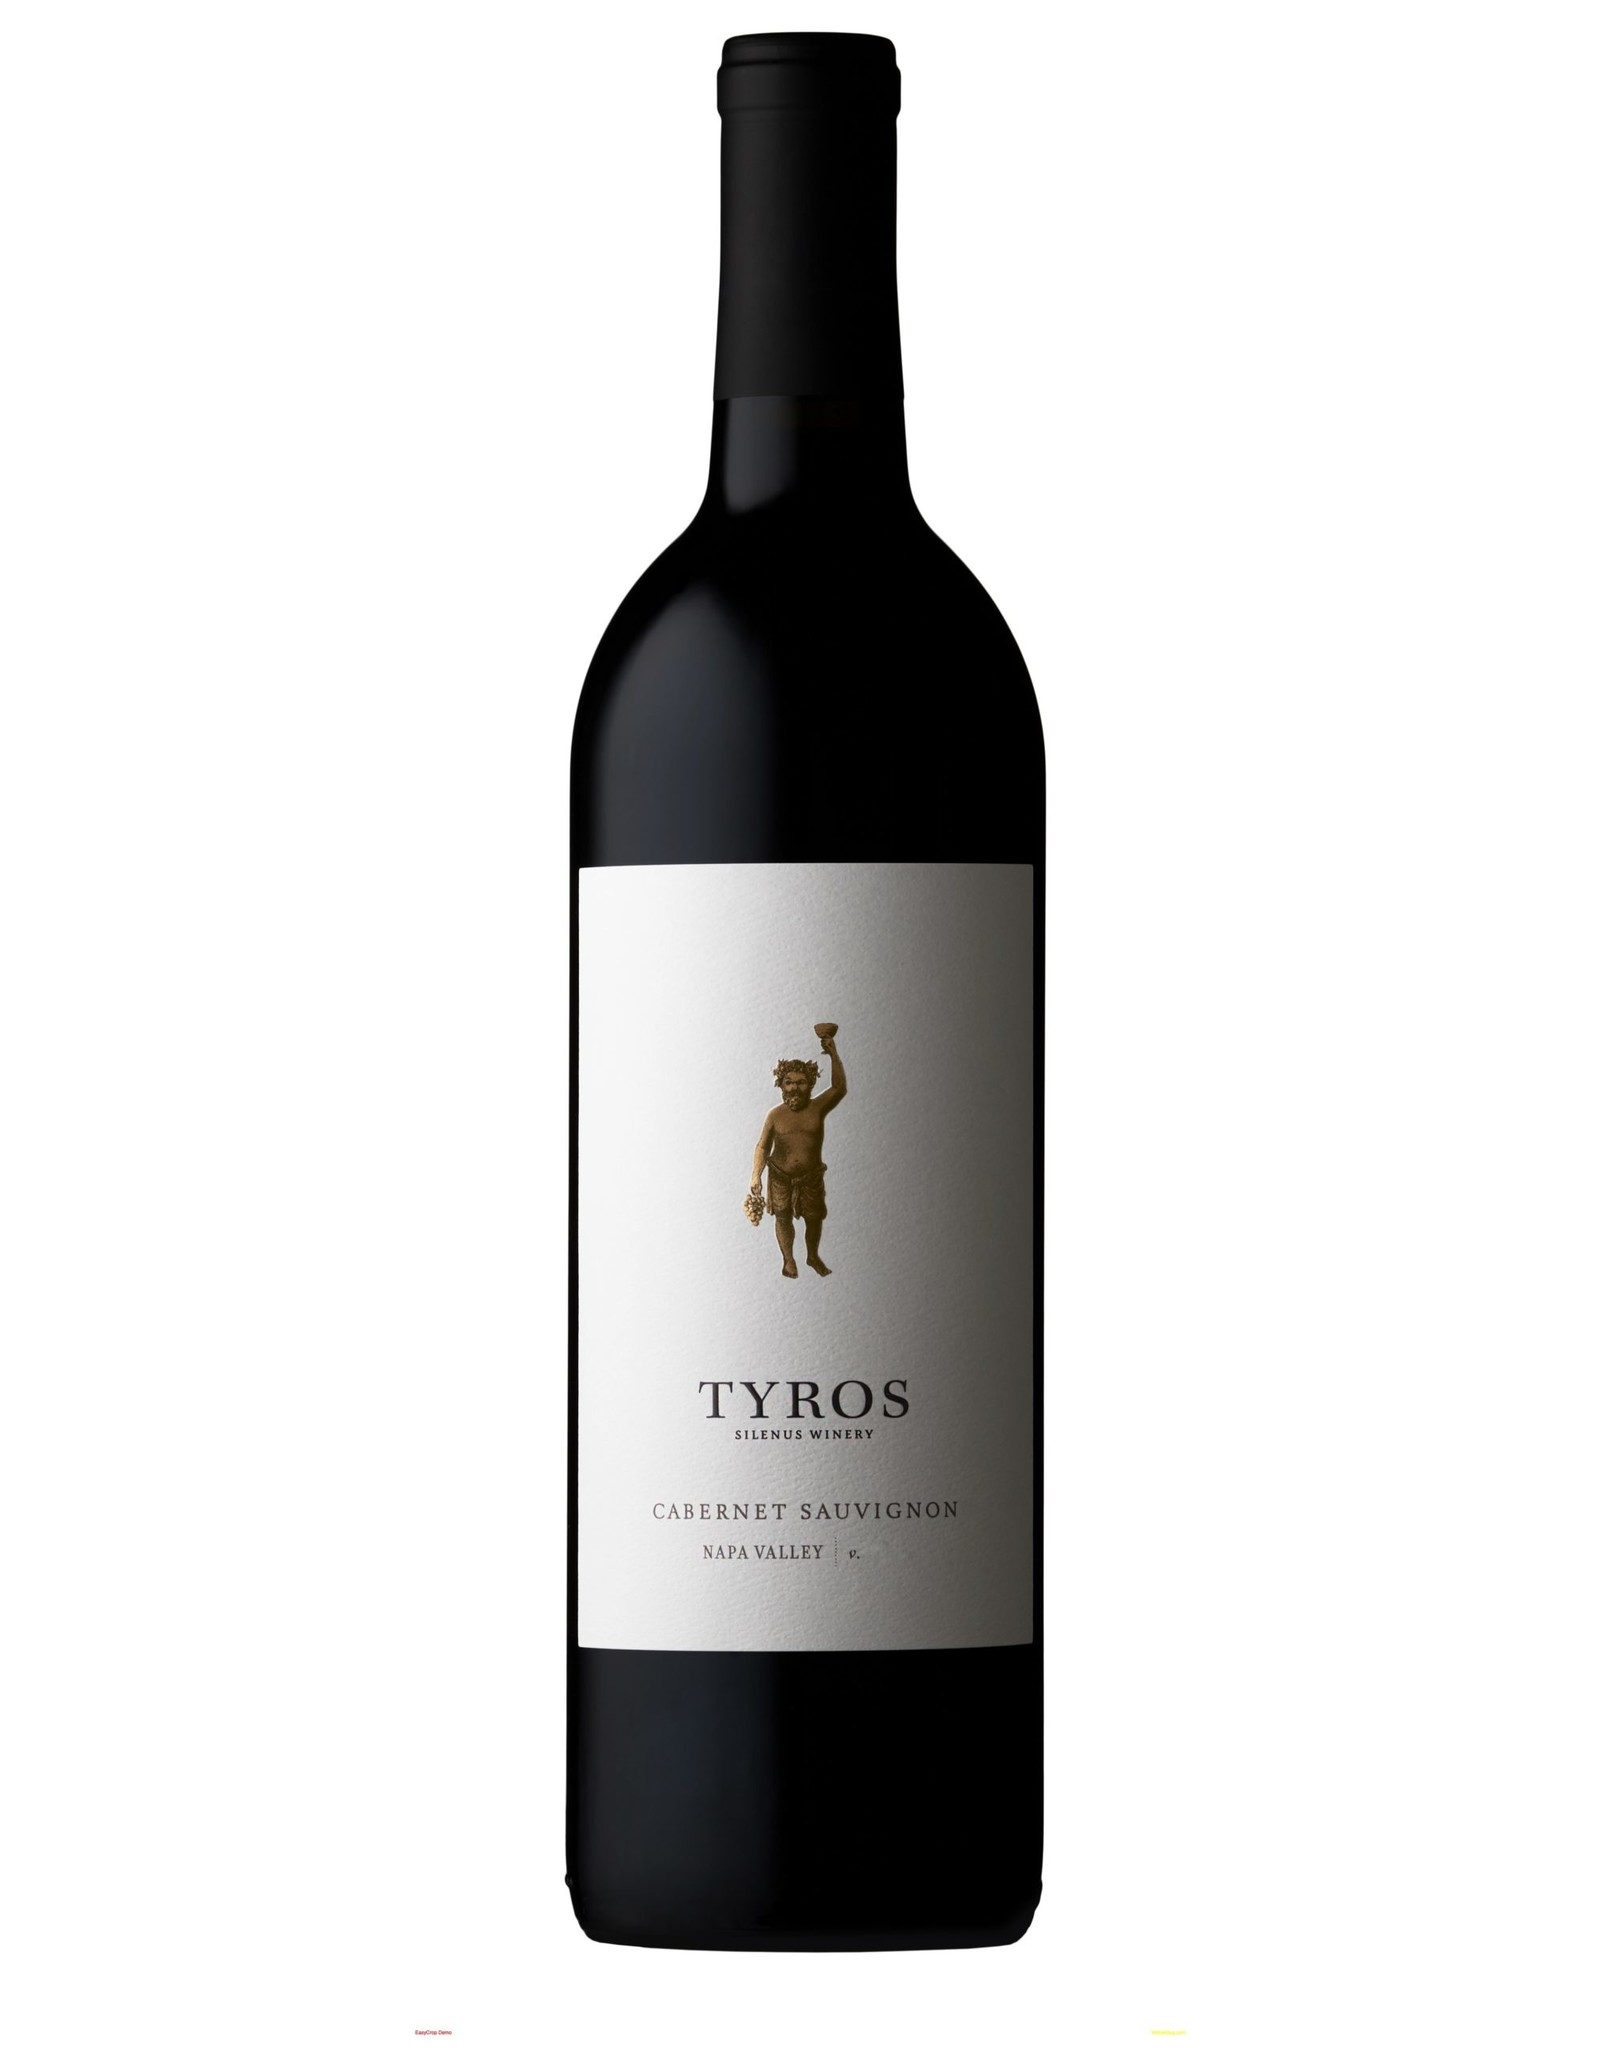 Silenus Winery Tyros Cabernet Sauvignon